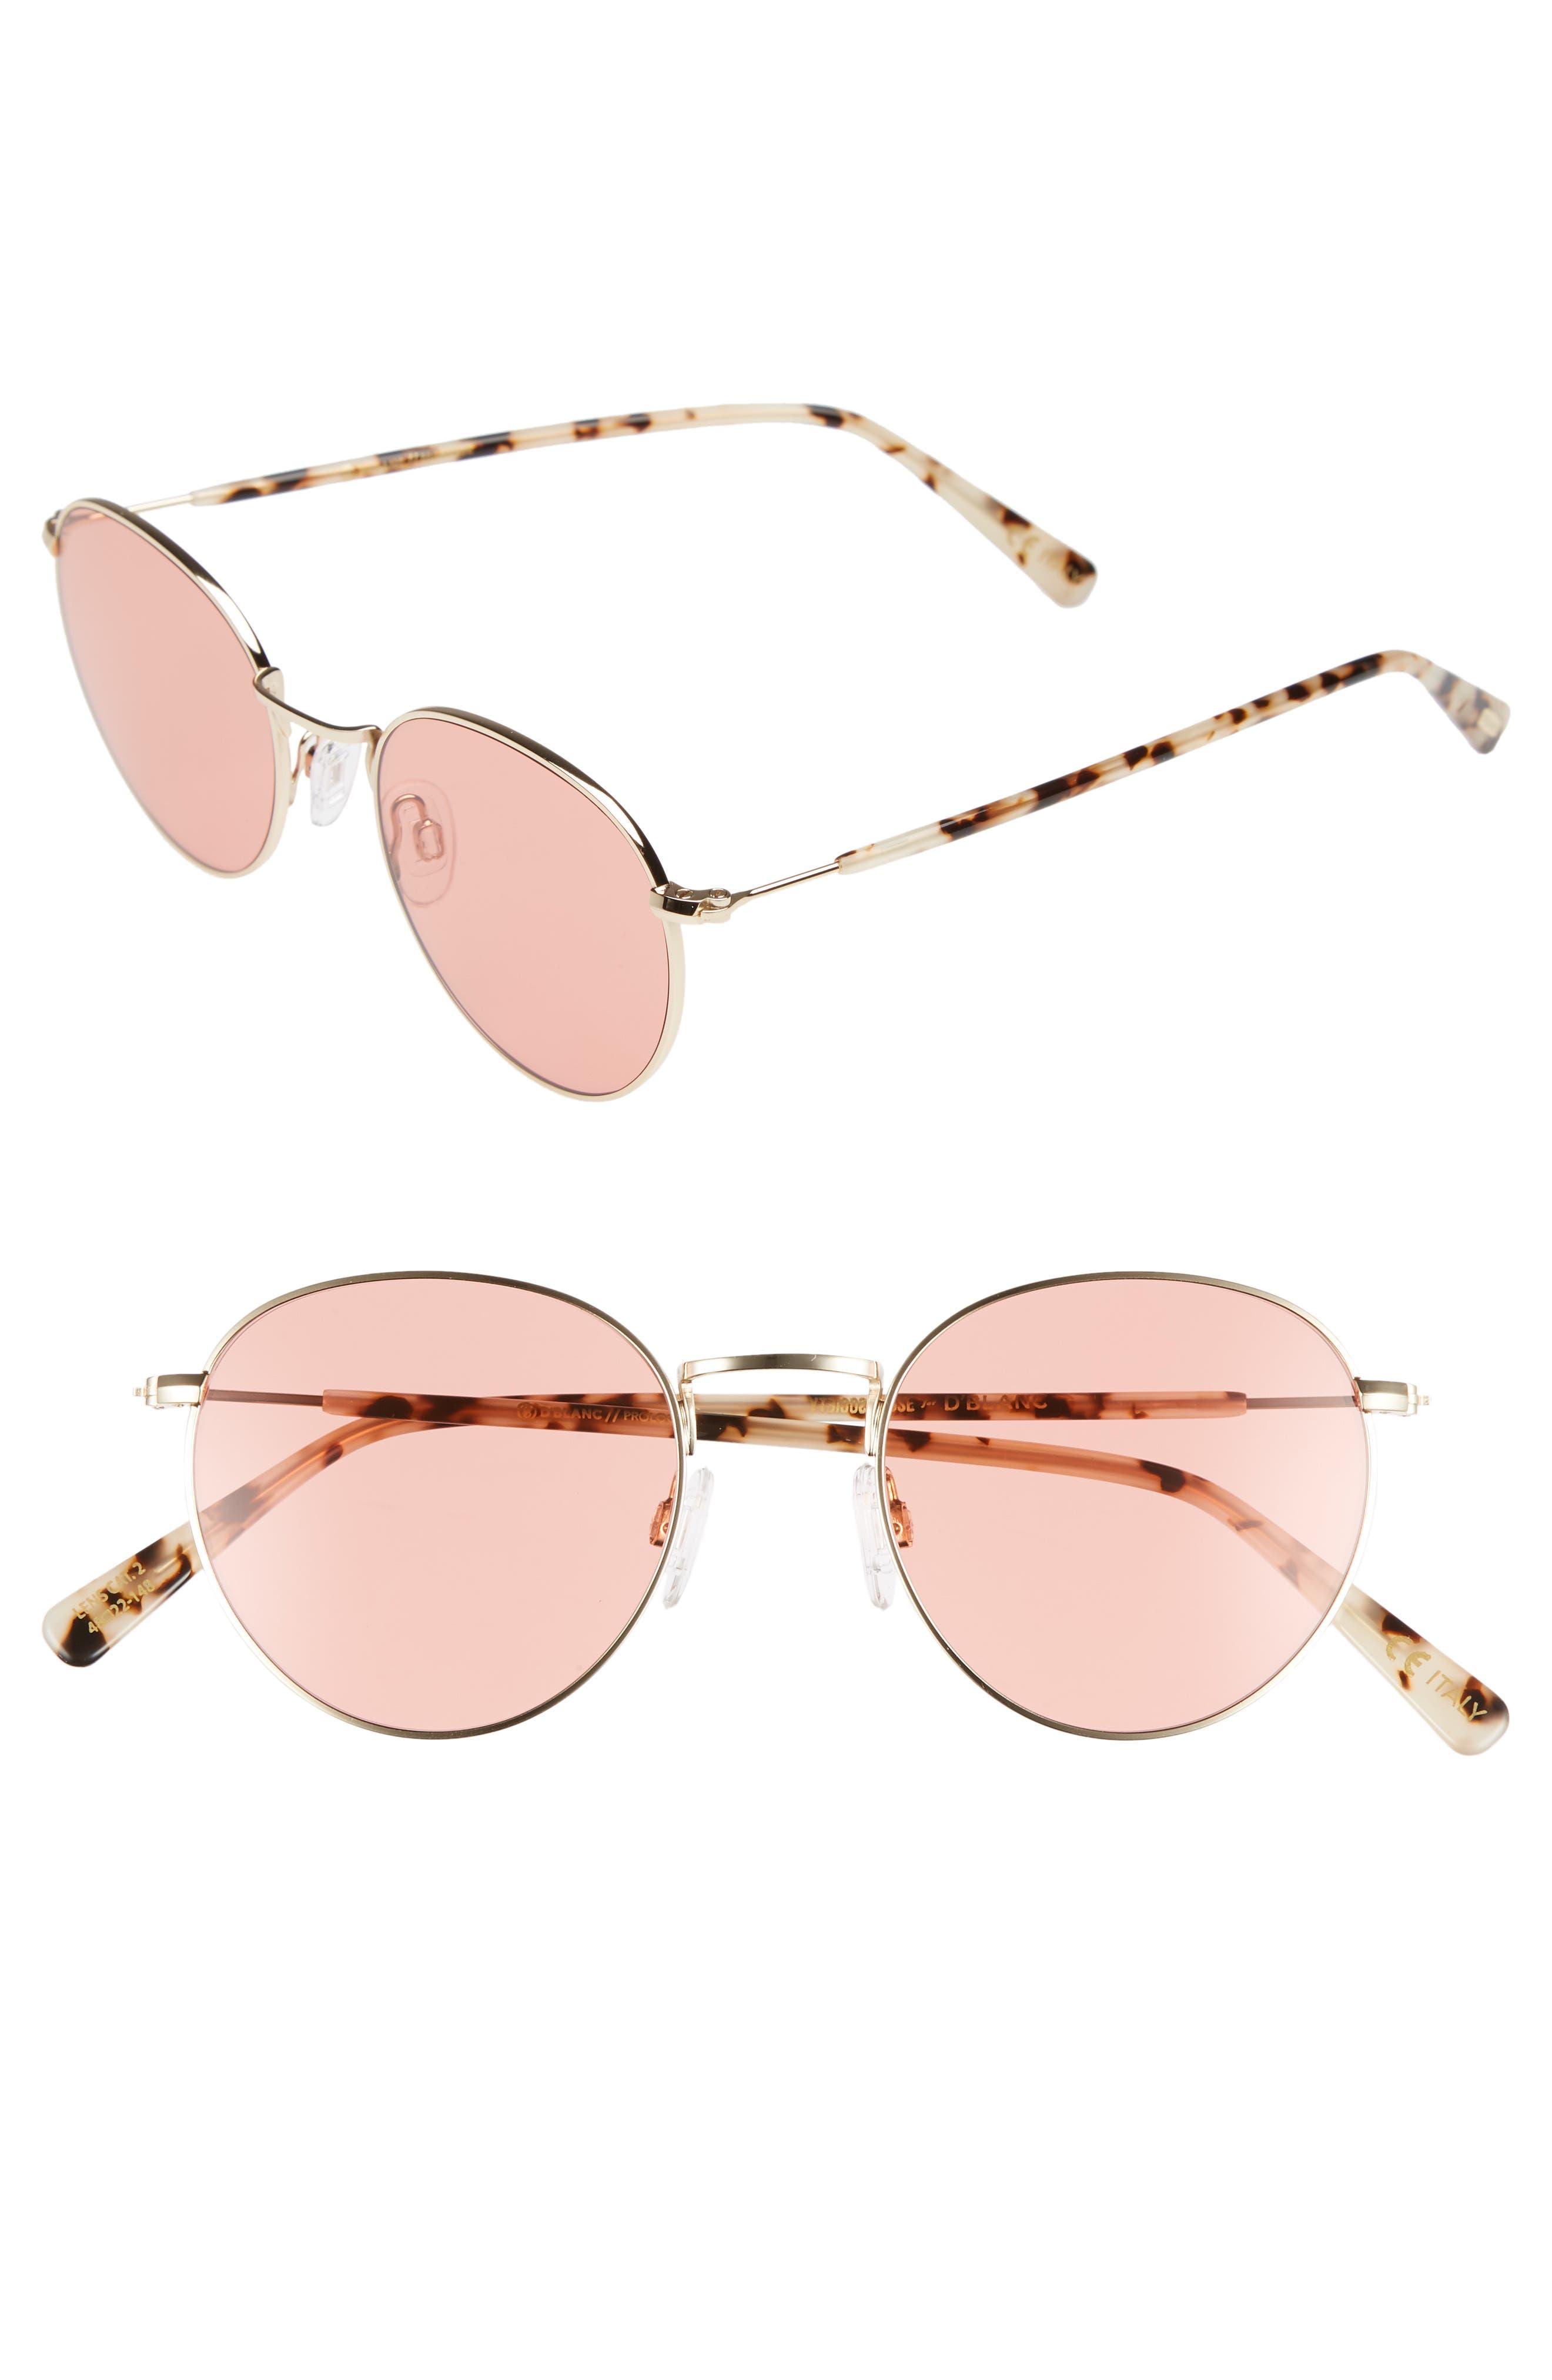 D'BLANC Prologue 48mm Sunglasses,                             Main thumbnail 1, color,                             710